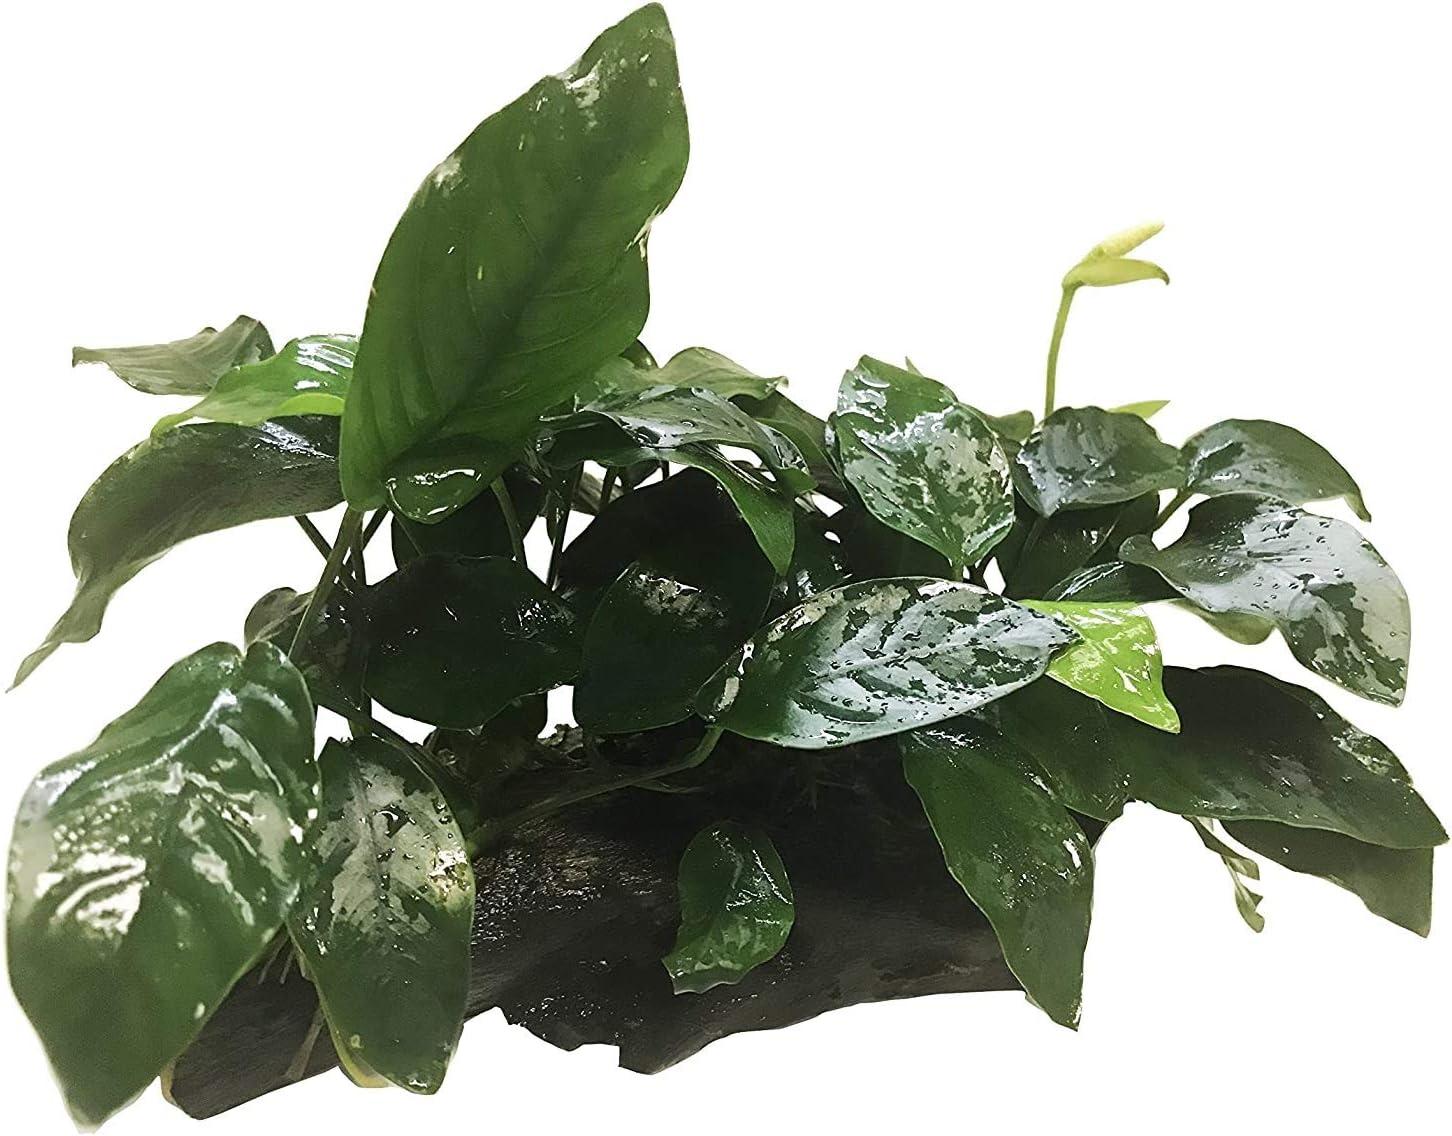 Greenpro Anubias Java Fern Moss and Freshwater More Aqua free Superlatite Live